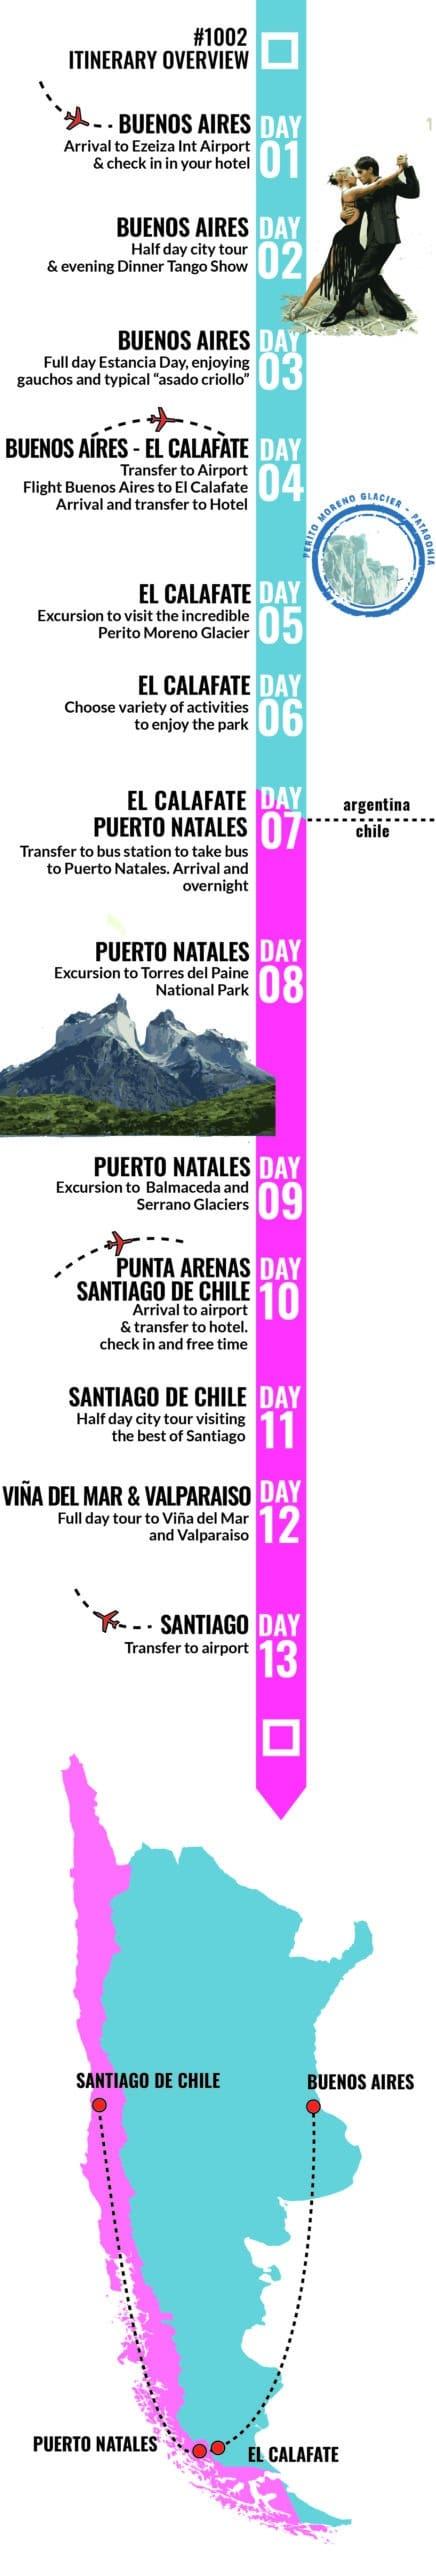 Buenos Aires, Puerto Natales, Torres del Paine, El Calafate, Santiago de Chile - Argentina and Chile in 12 nights II - RipioTurismo DMC for Argentina and Chile